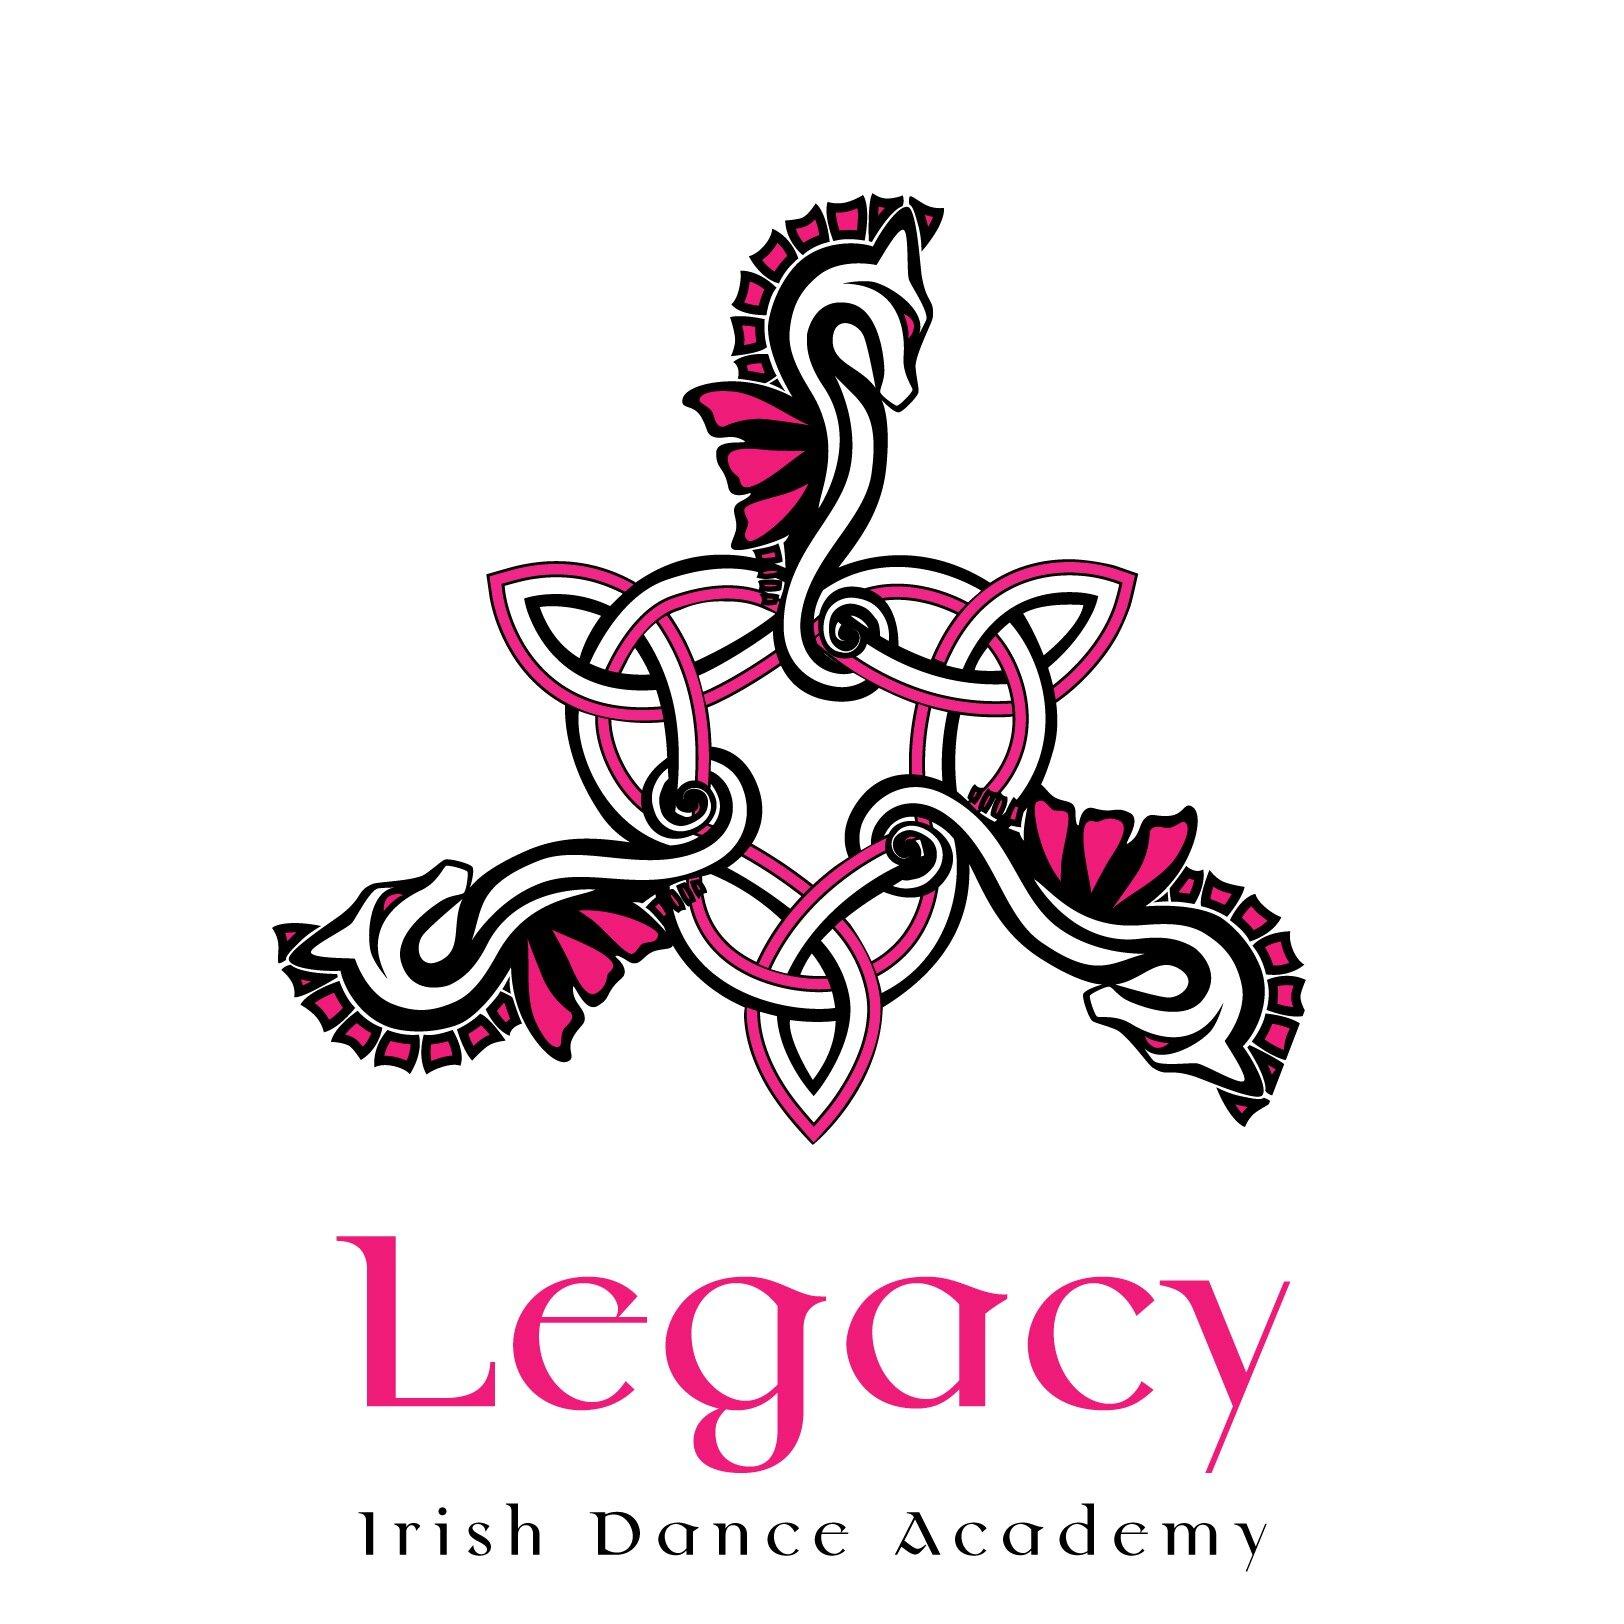 Legacy Irish Dance